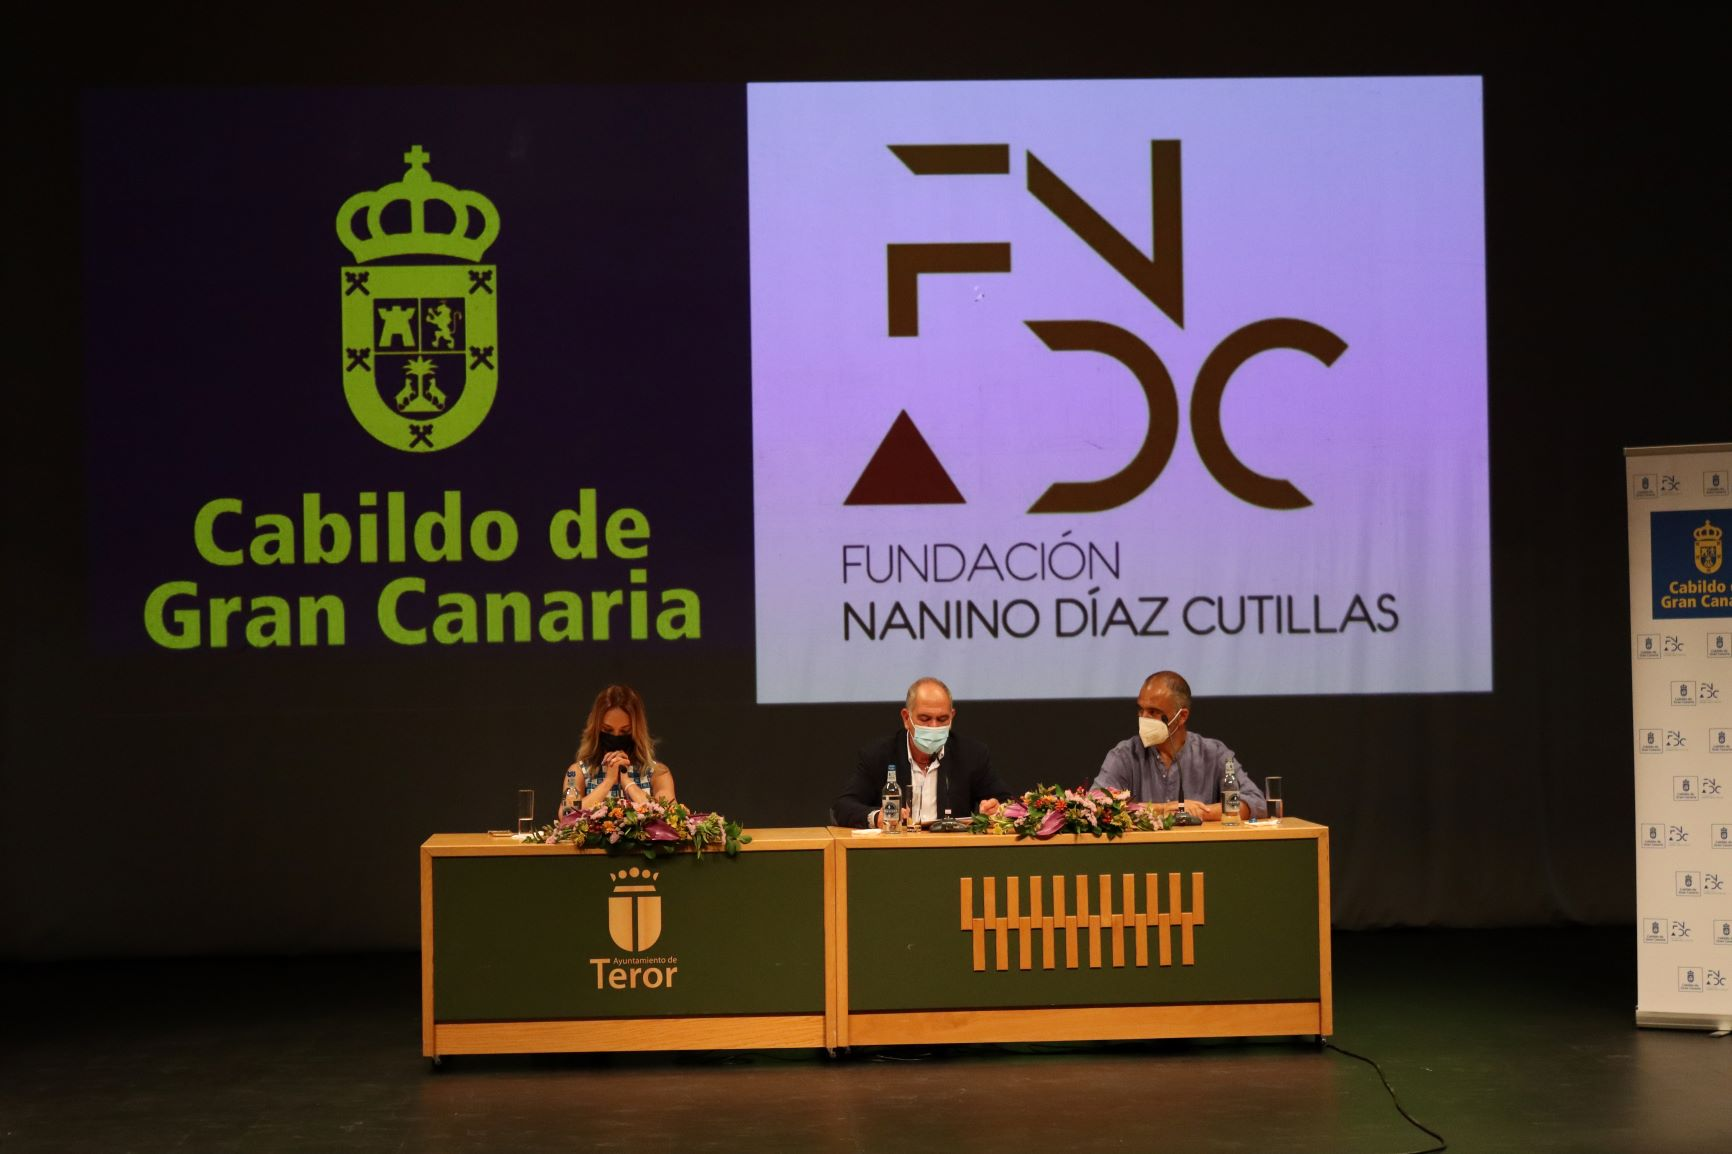 Gran Canaria vuelve a cantar sus décimas a la Virgen del Pino